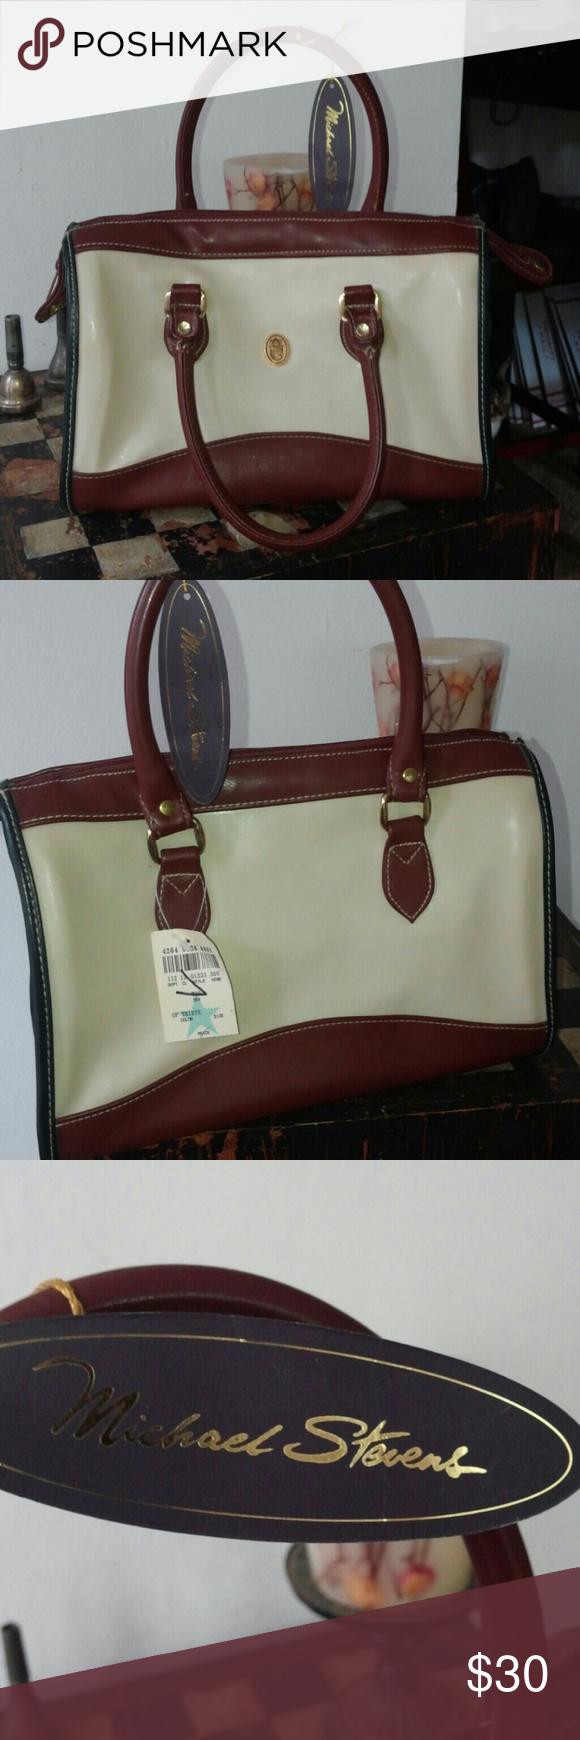 Vintage Michael Stevens Bag Beautiful, brand new bag. Couple unnoticeable shallow punture holes in shoulder strap, shown in last picture. Vintage Bags Crossbody Bags